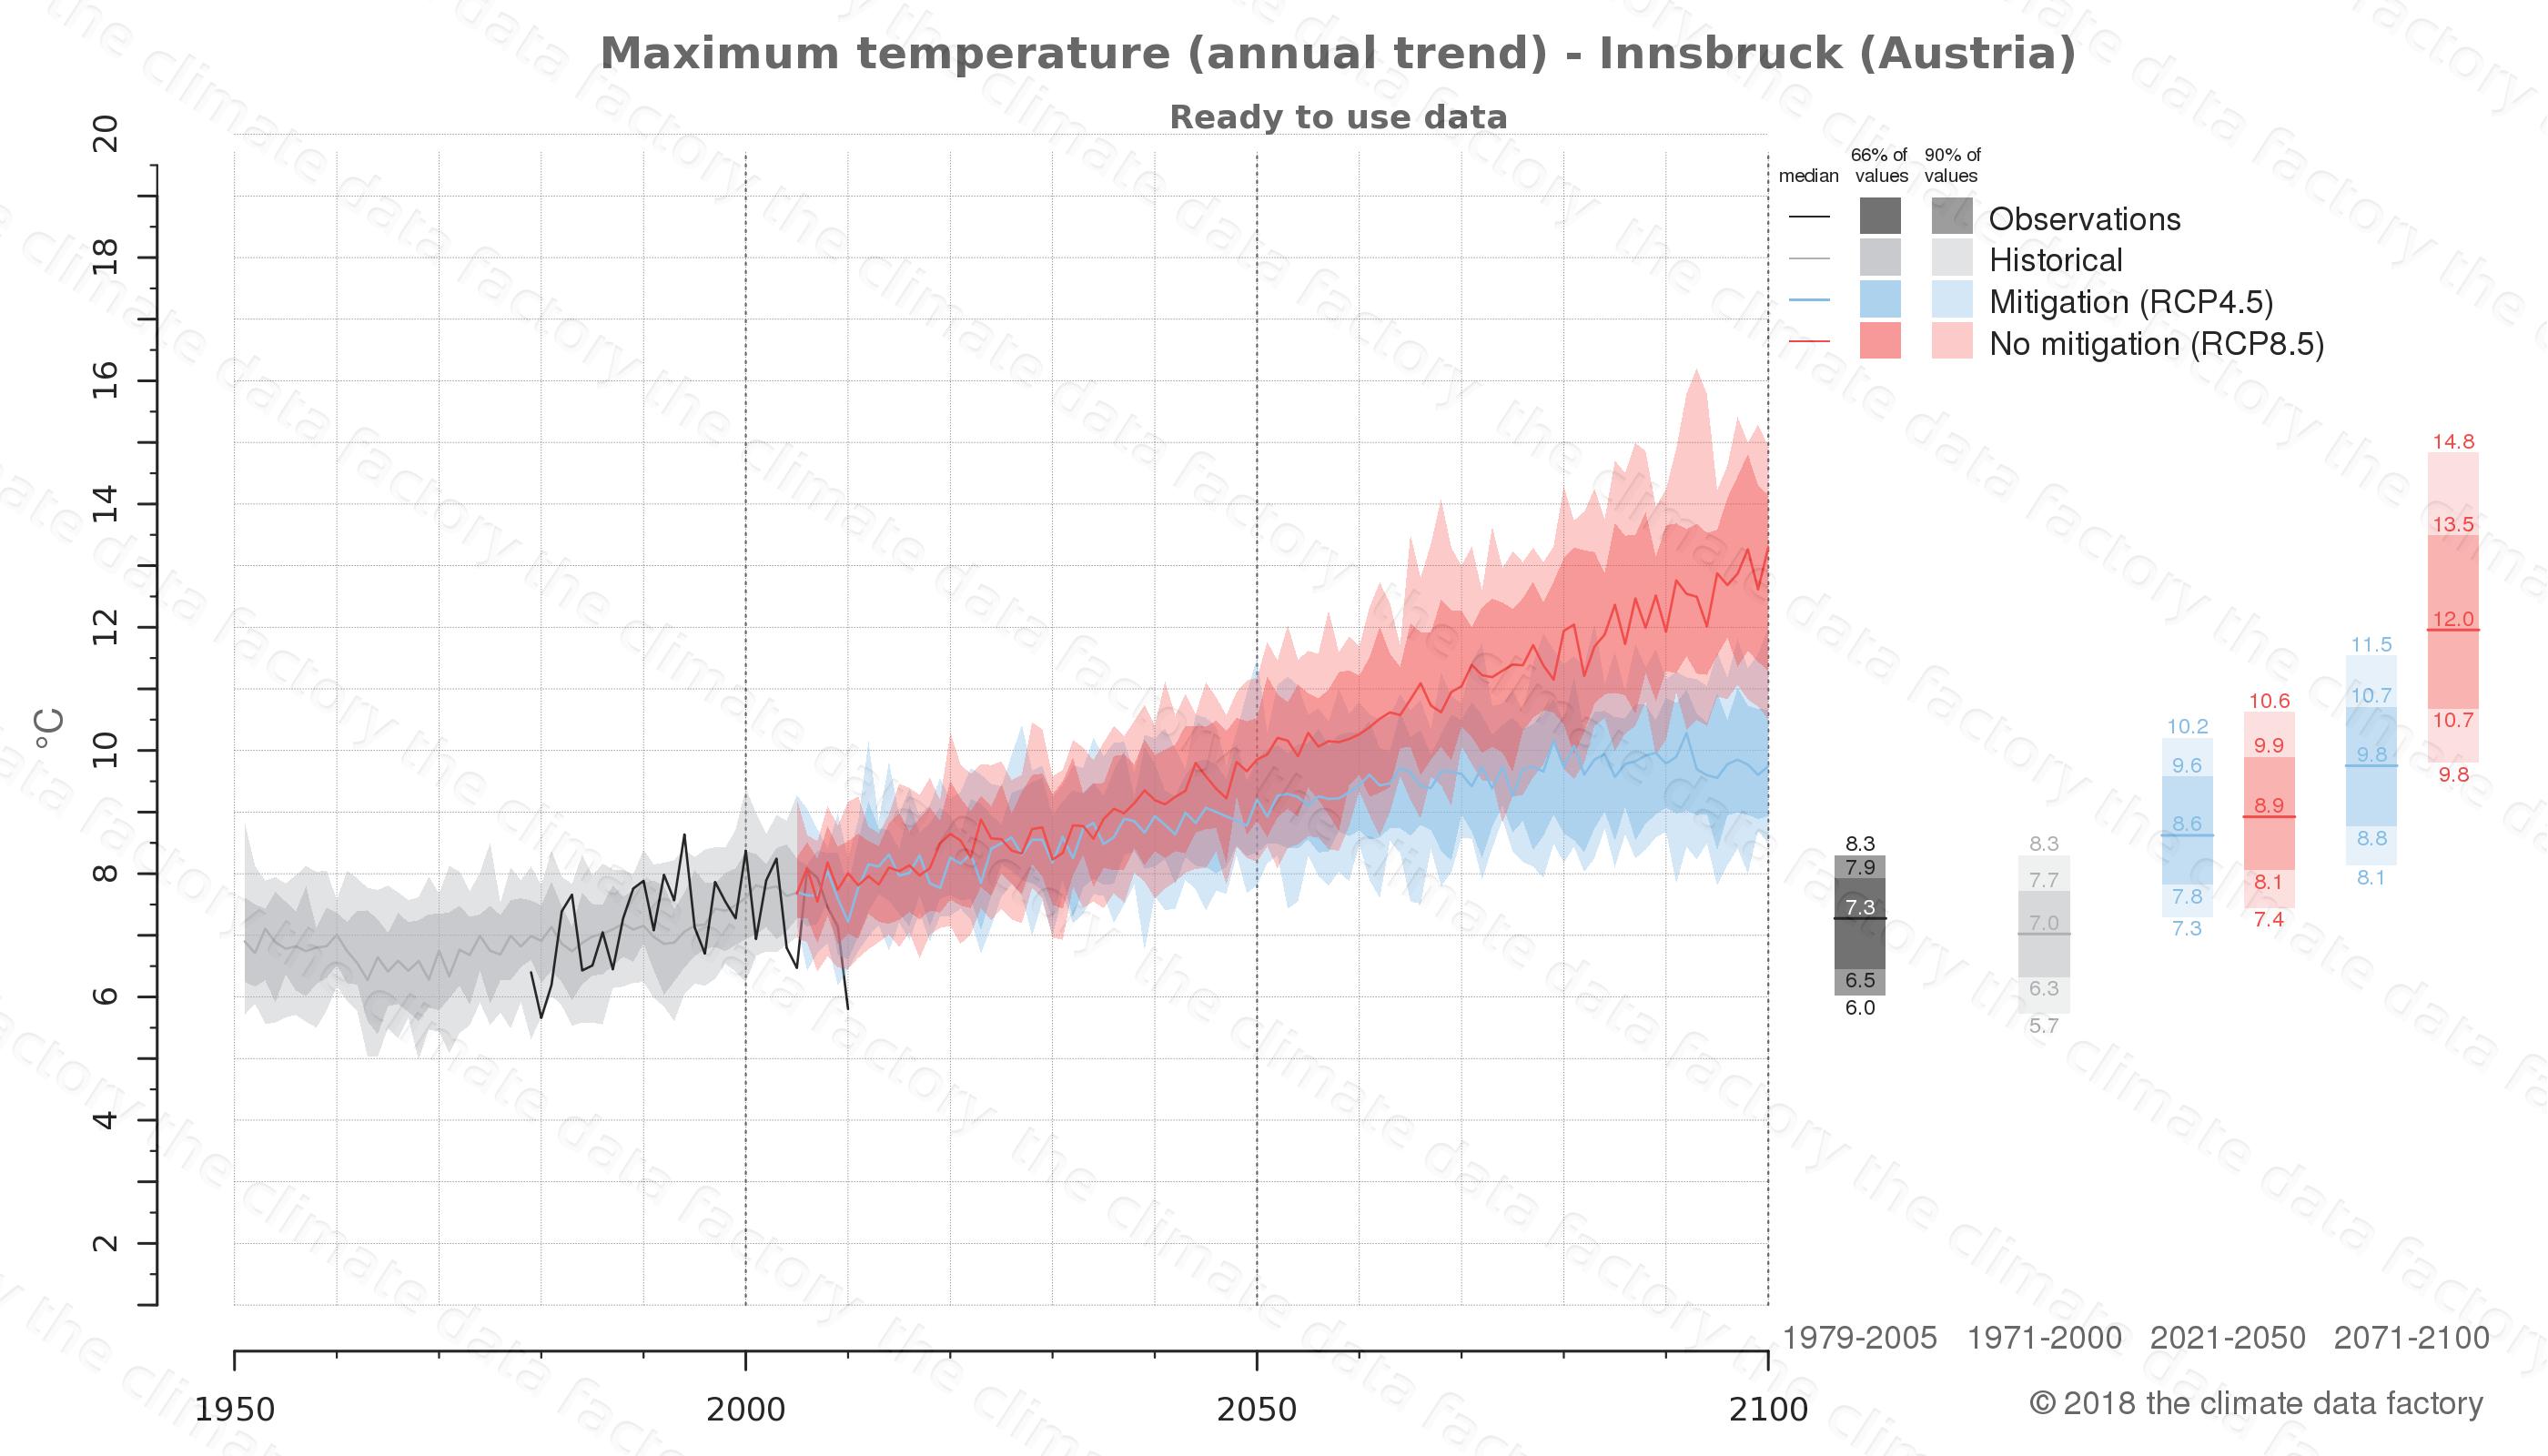 climate change data policy adaptation climate graph city data maximum-temperature innsbruck austria